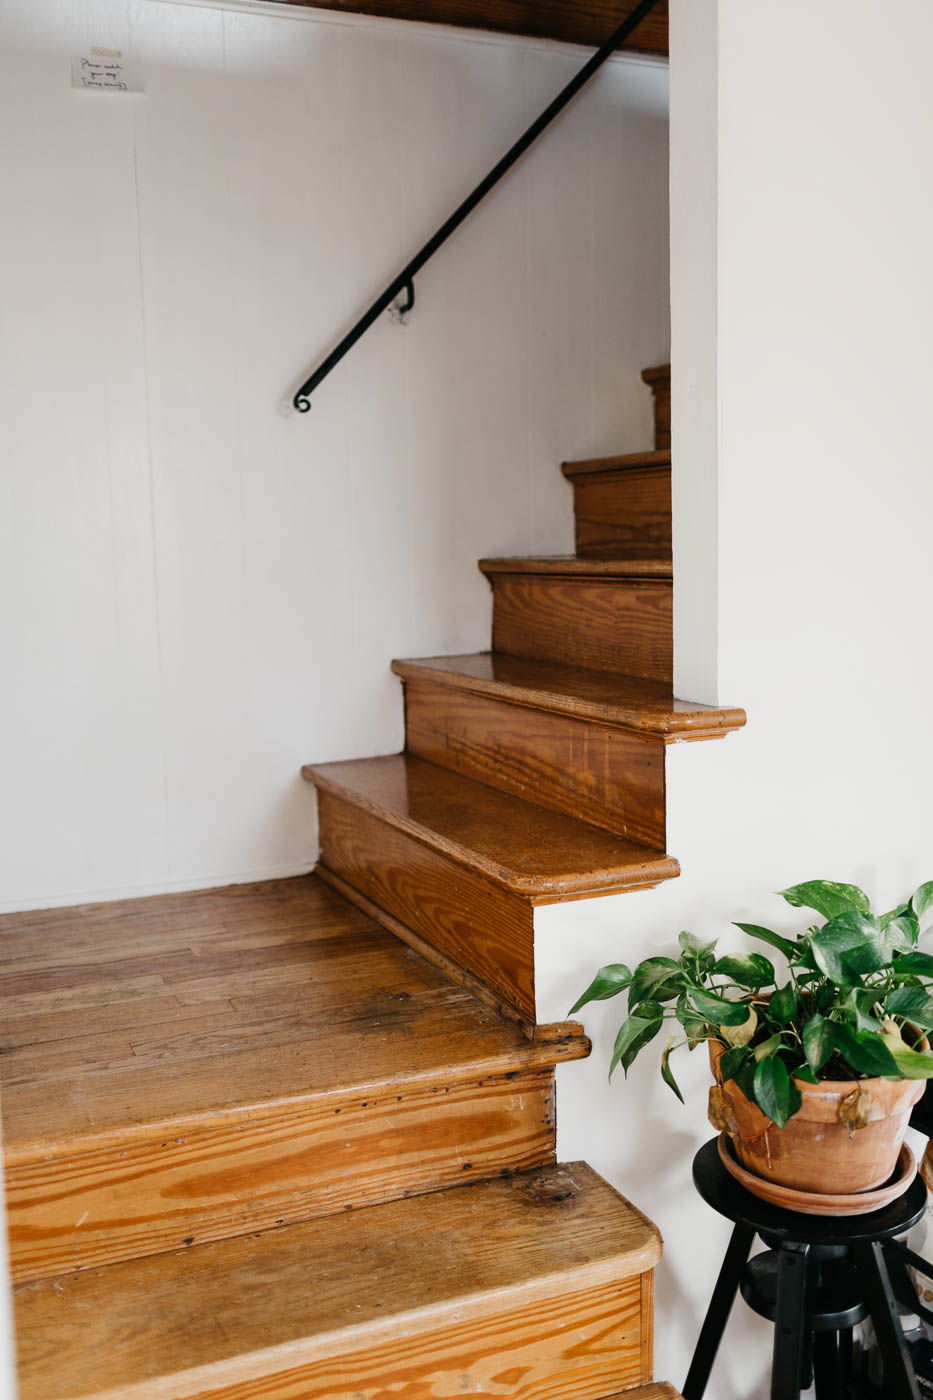 cozy-casa-nashville-tn-natural-light-studio-photography-ideas-lifestyle-photographer-photography-21.jpg